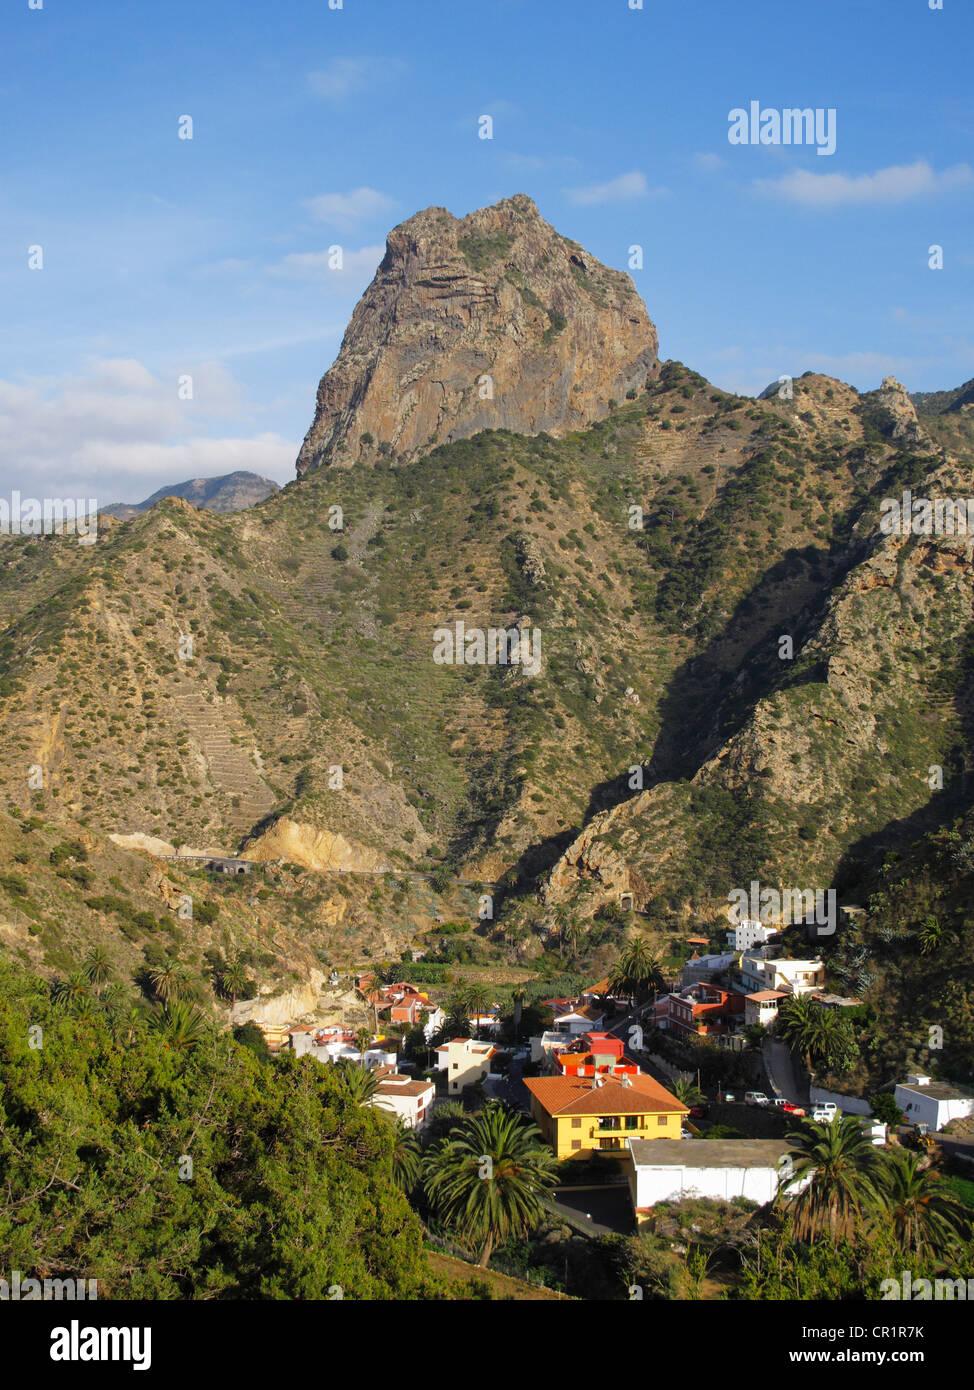 Roque Cano, Vallehermoso, La Gomera, Canary Islands, Spain, Europe - Stock Image